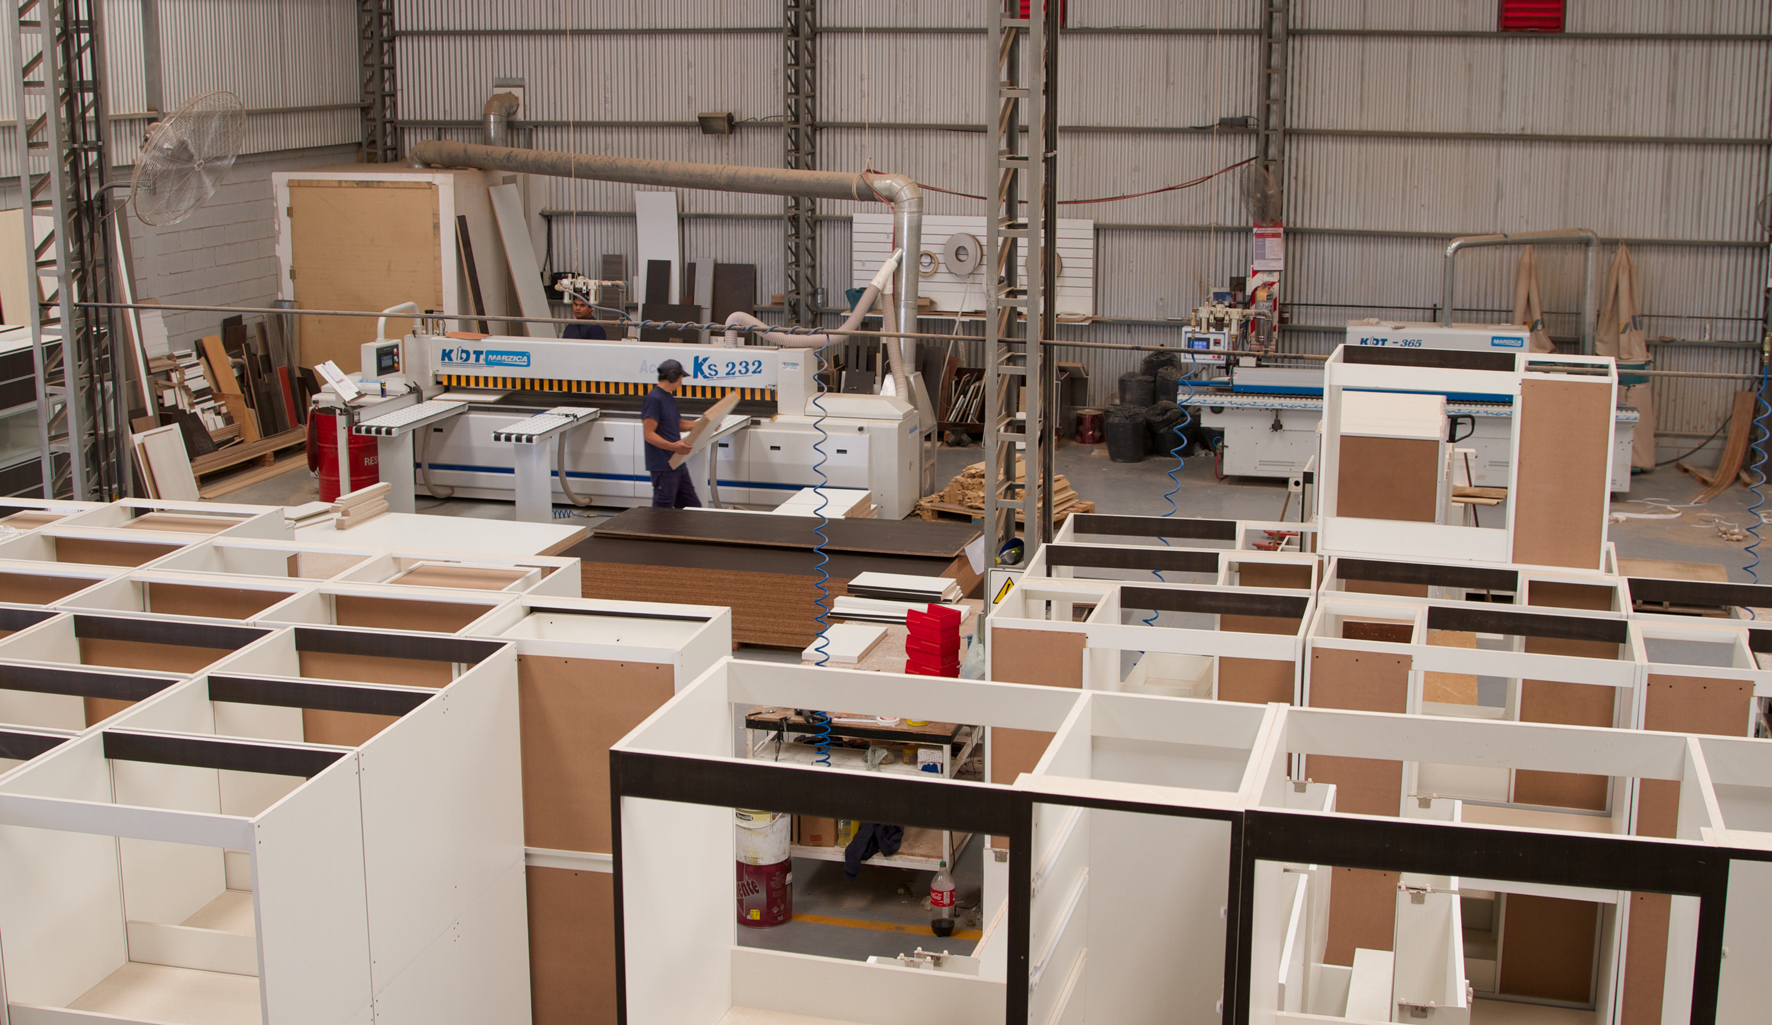 F bricas de muebles en china buscar an cambiar ubicaci n a - Fabricas de madera ...